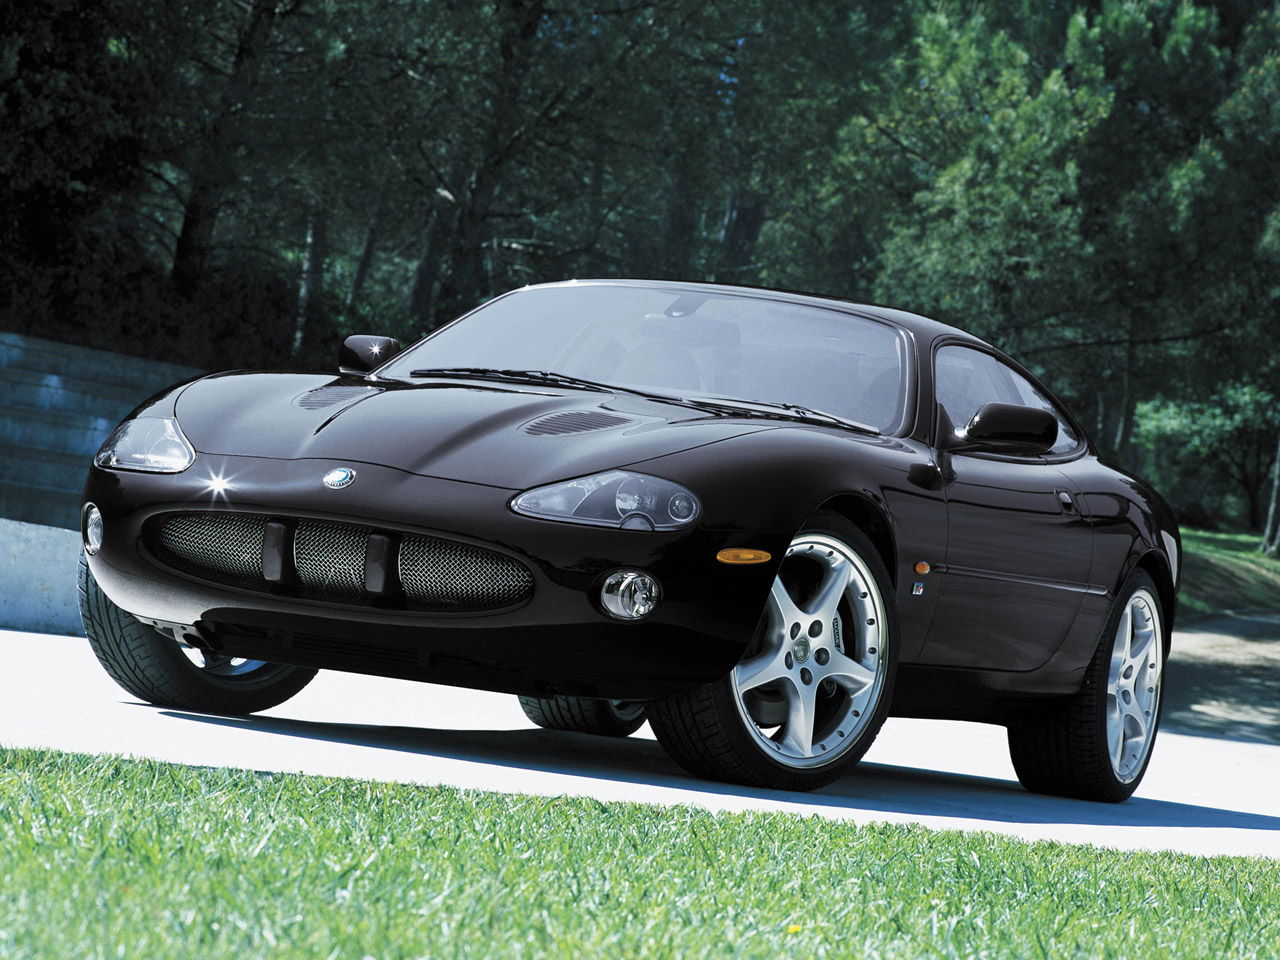 jaguar xk 8 coupe qev xk8 4 0 i v8 32v 284 cv donn es techniques des voitures puissance. Black Bedroom Furniture Sets. Home Design Ideas